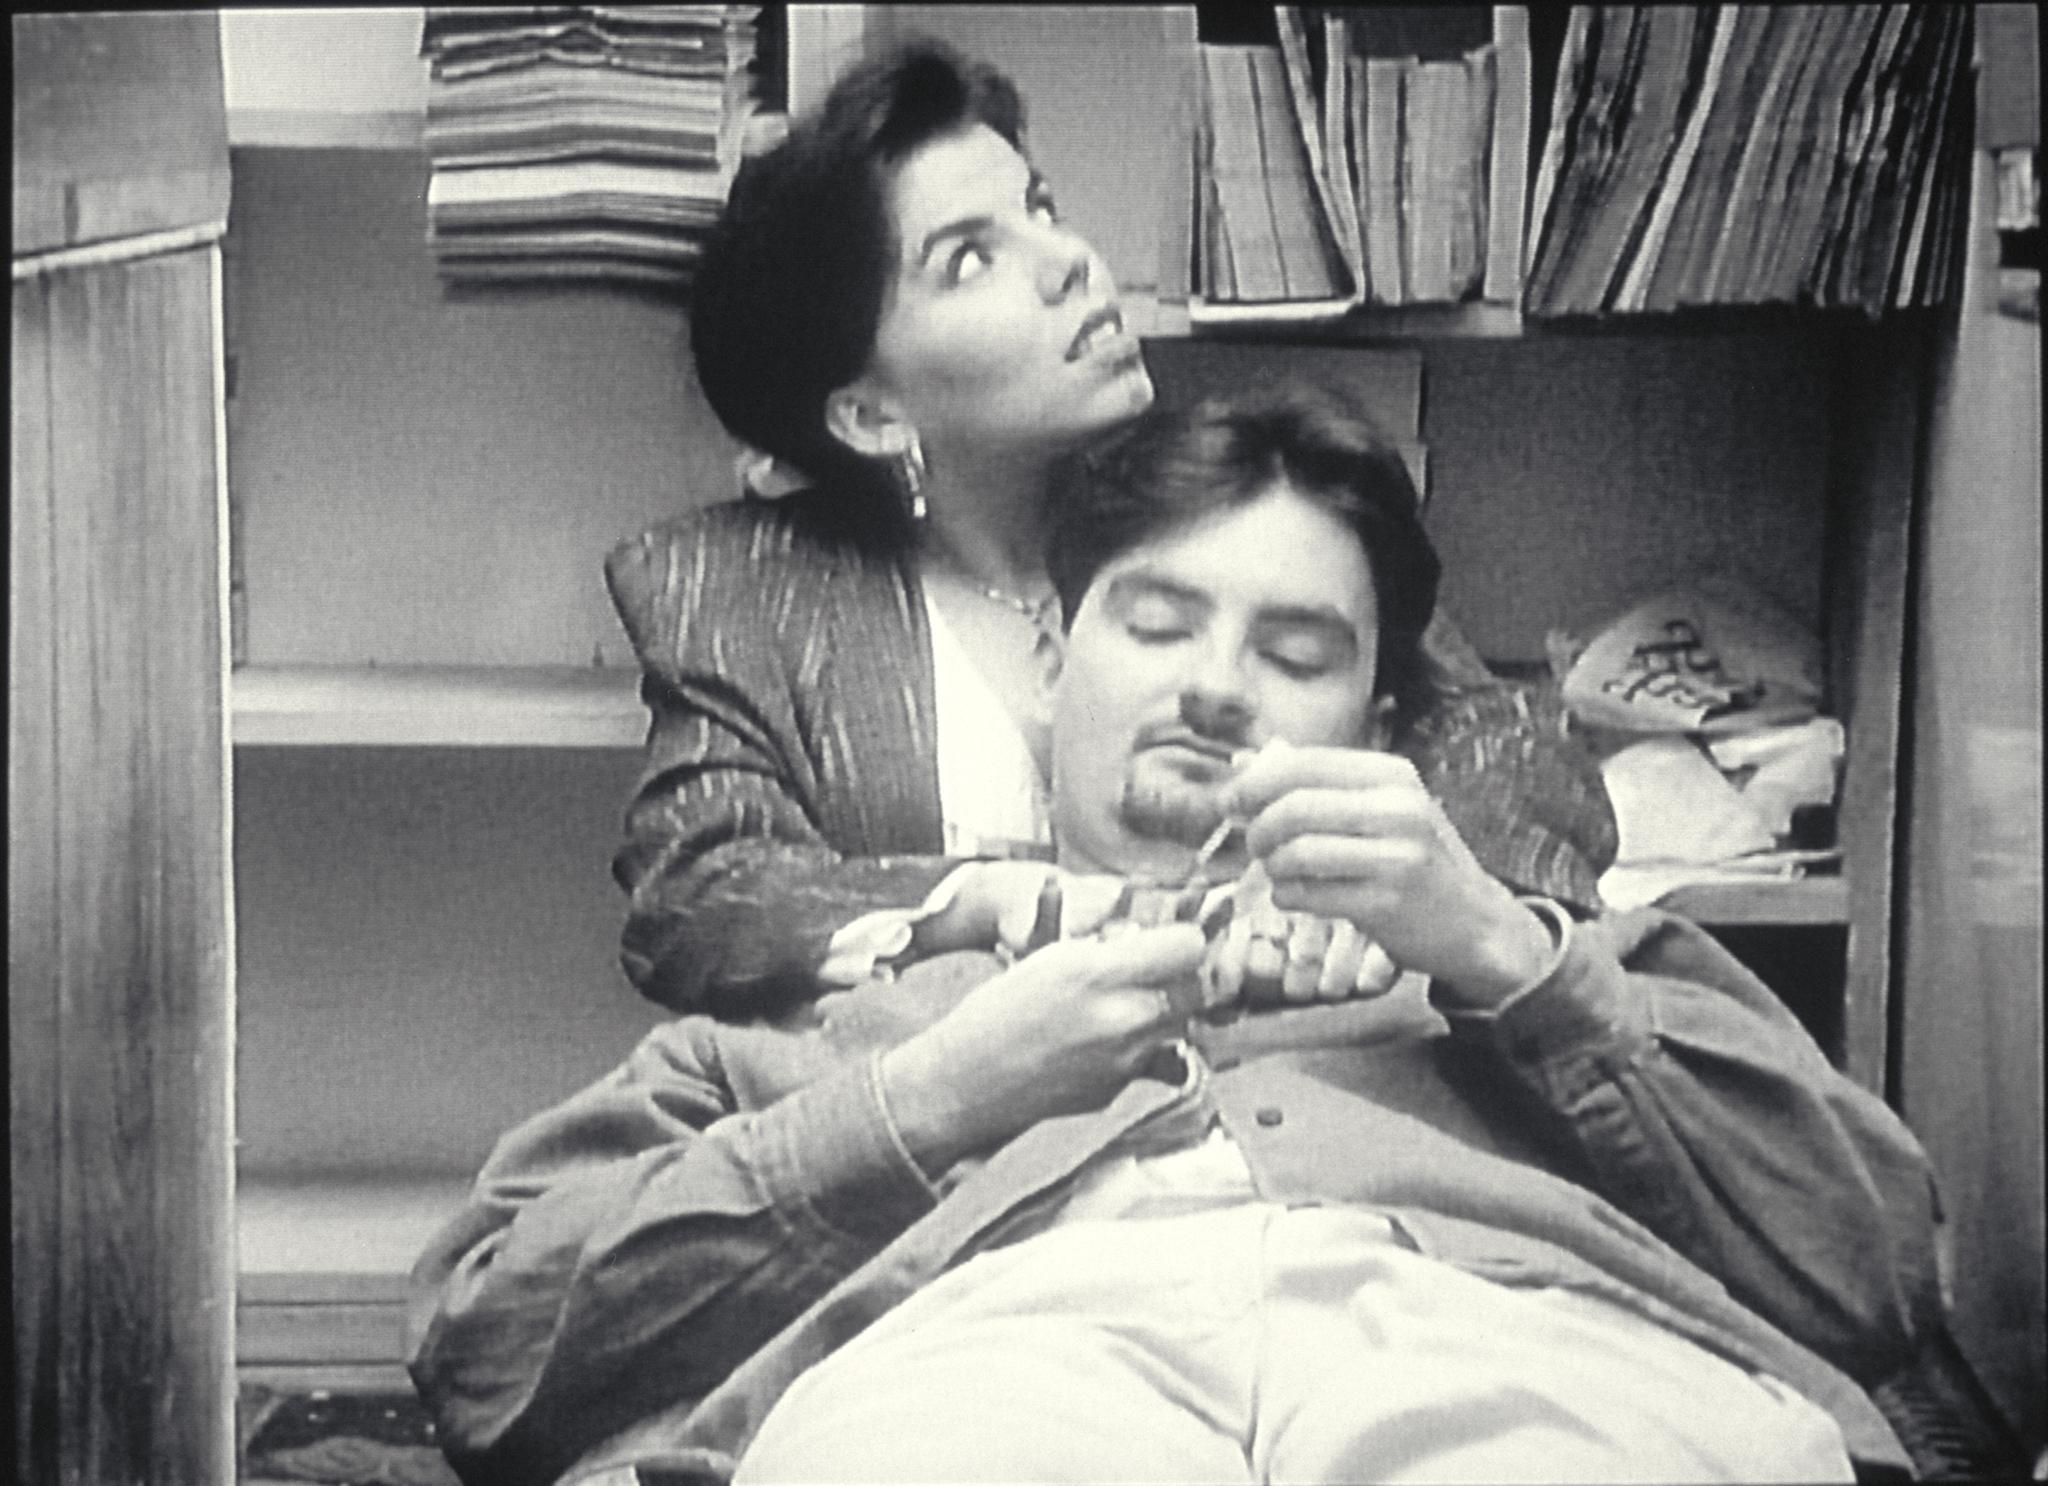 Marilyn Ghigliotti and Brian O'Halloran in Clerks (1994)